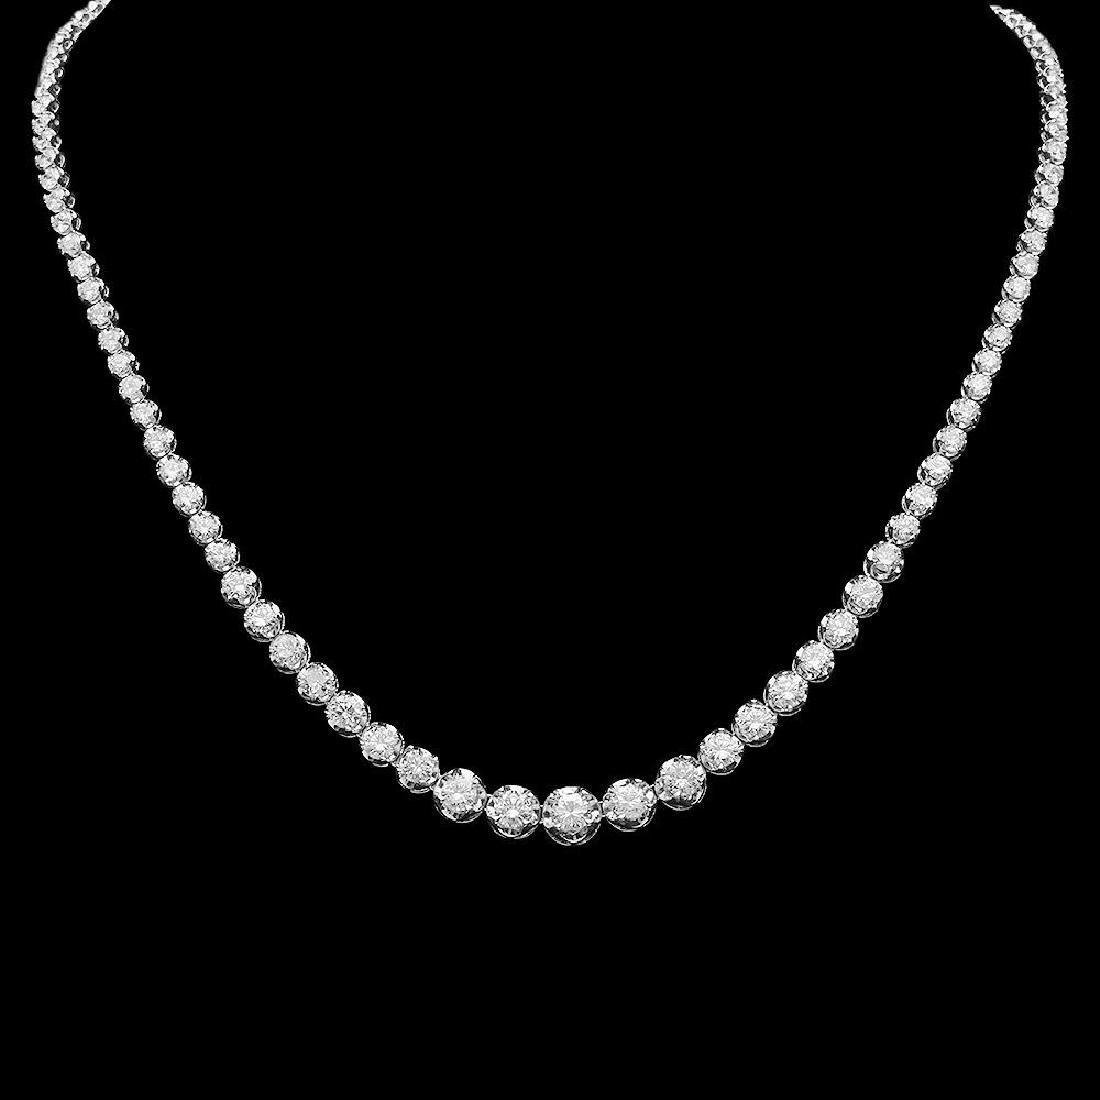 14K Gold 11.00ct Diamond Necklace